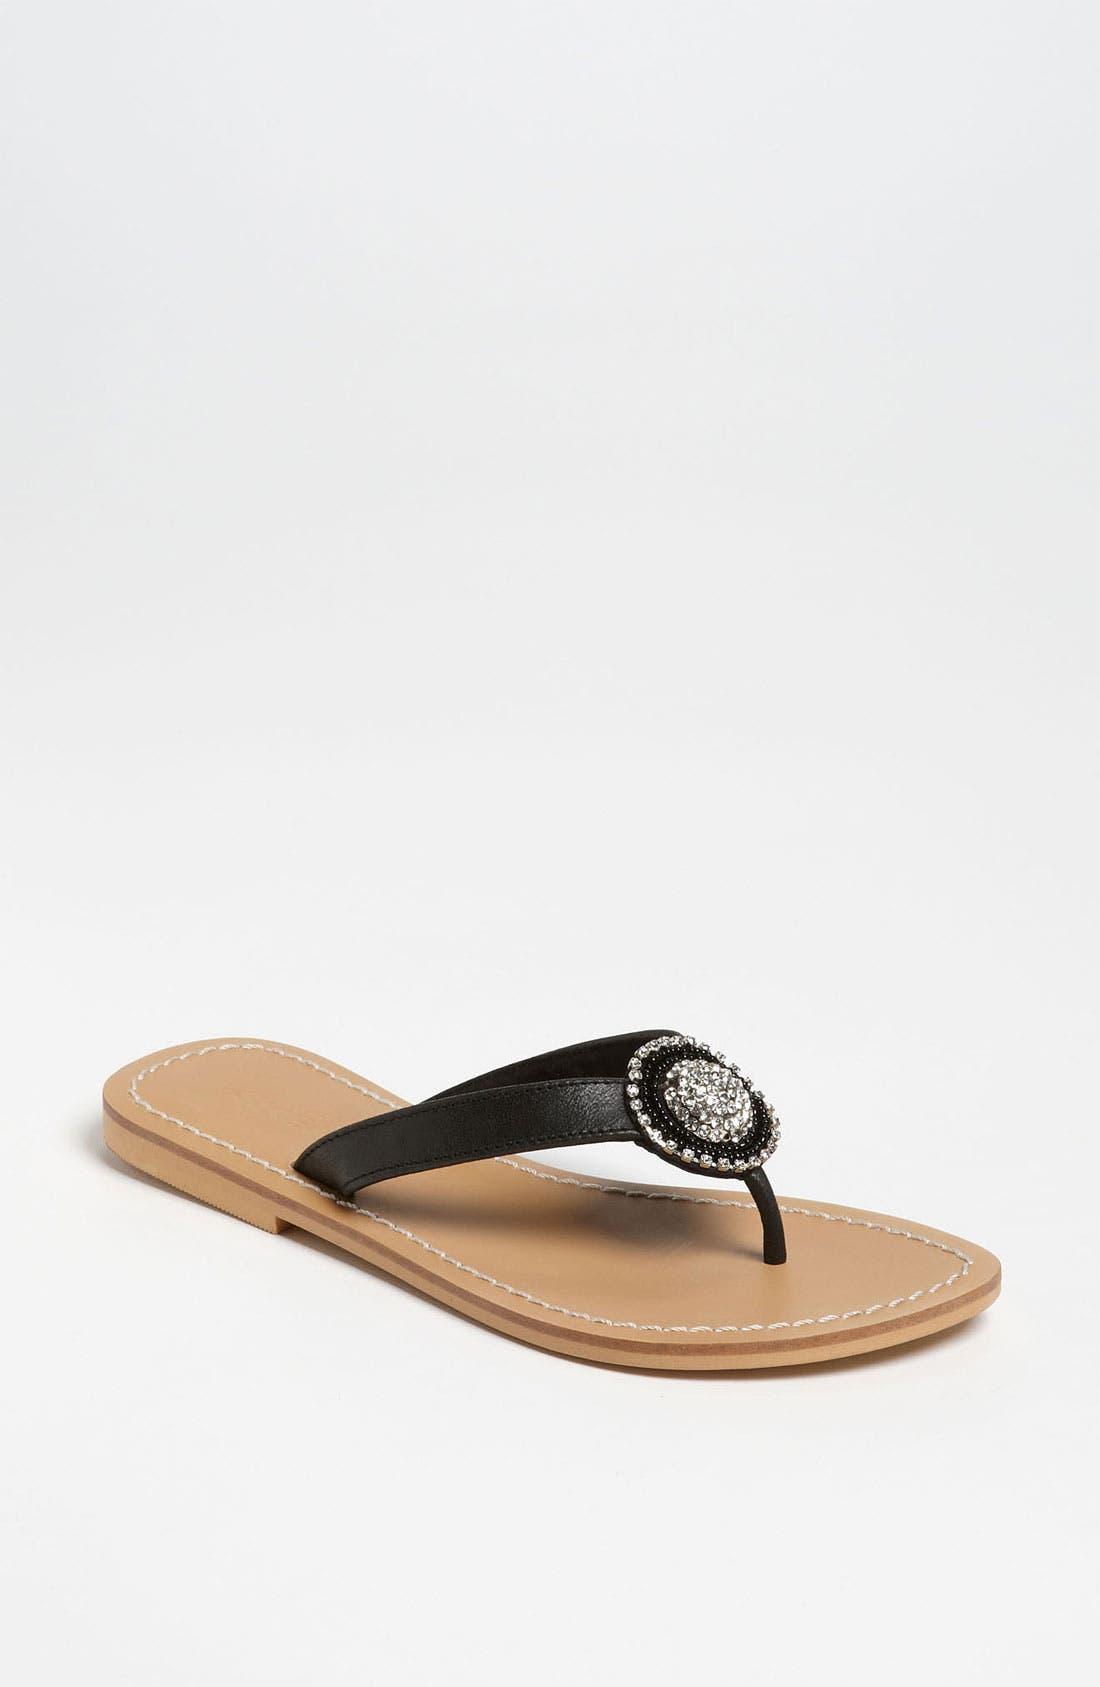 Main Image - Skemo 'Juanita' Sandal